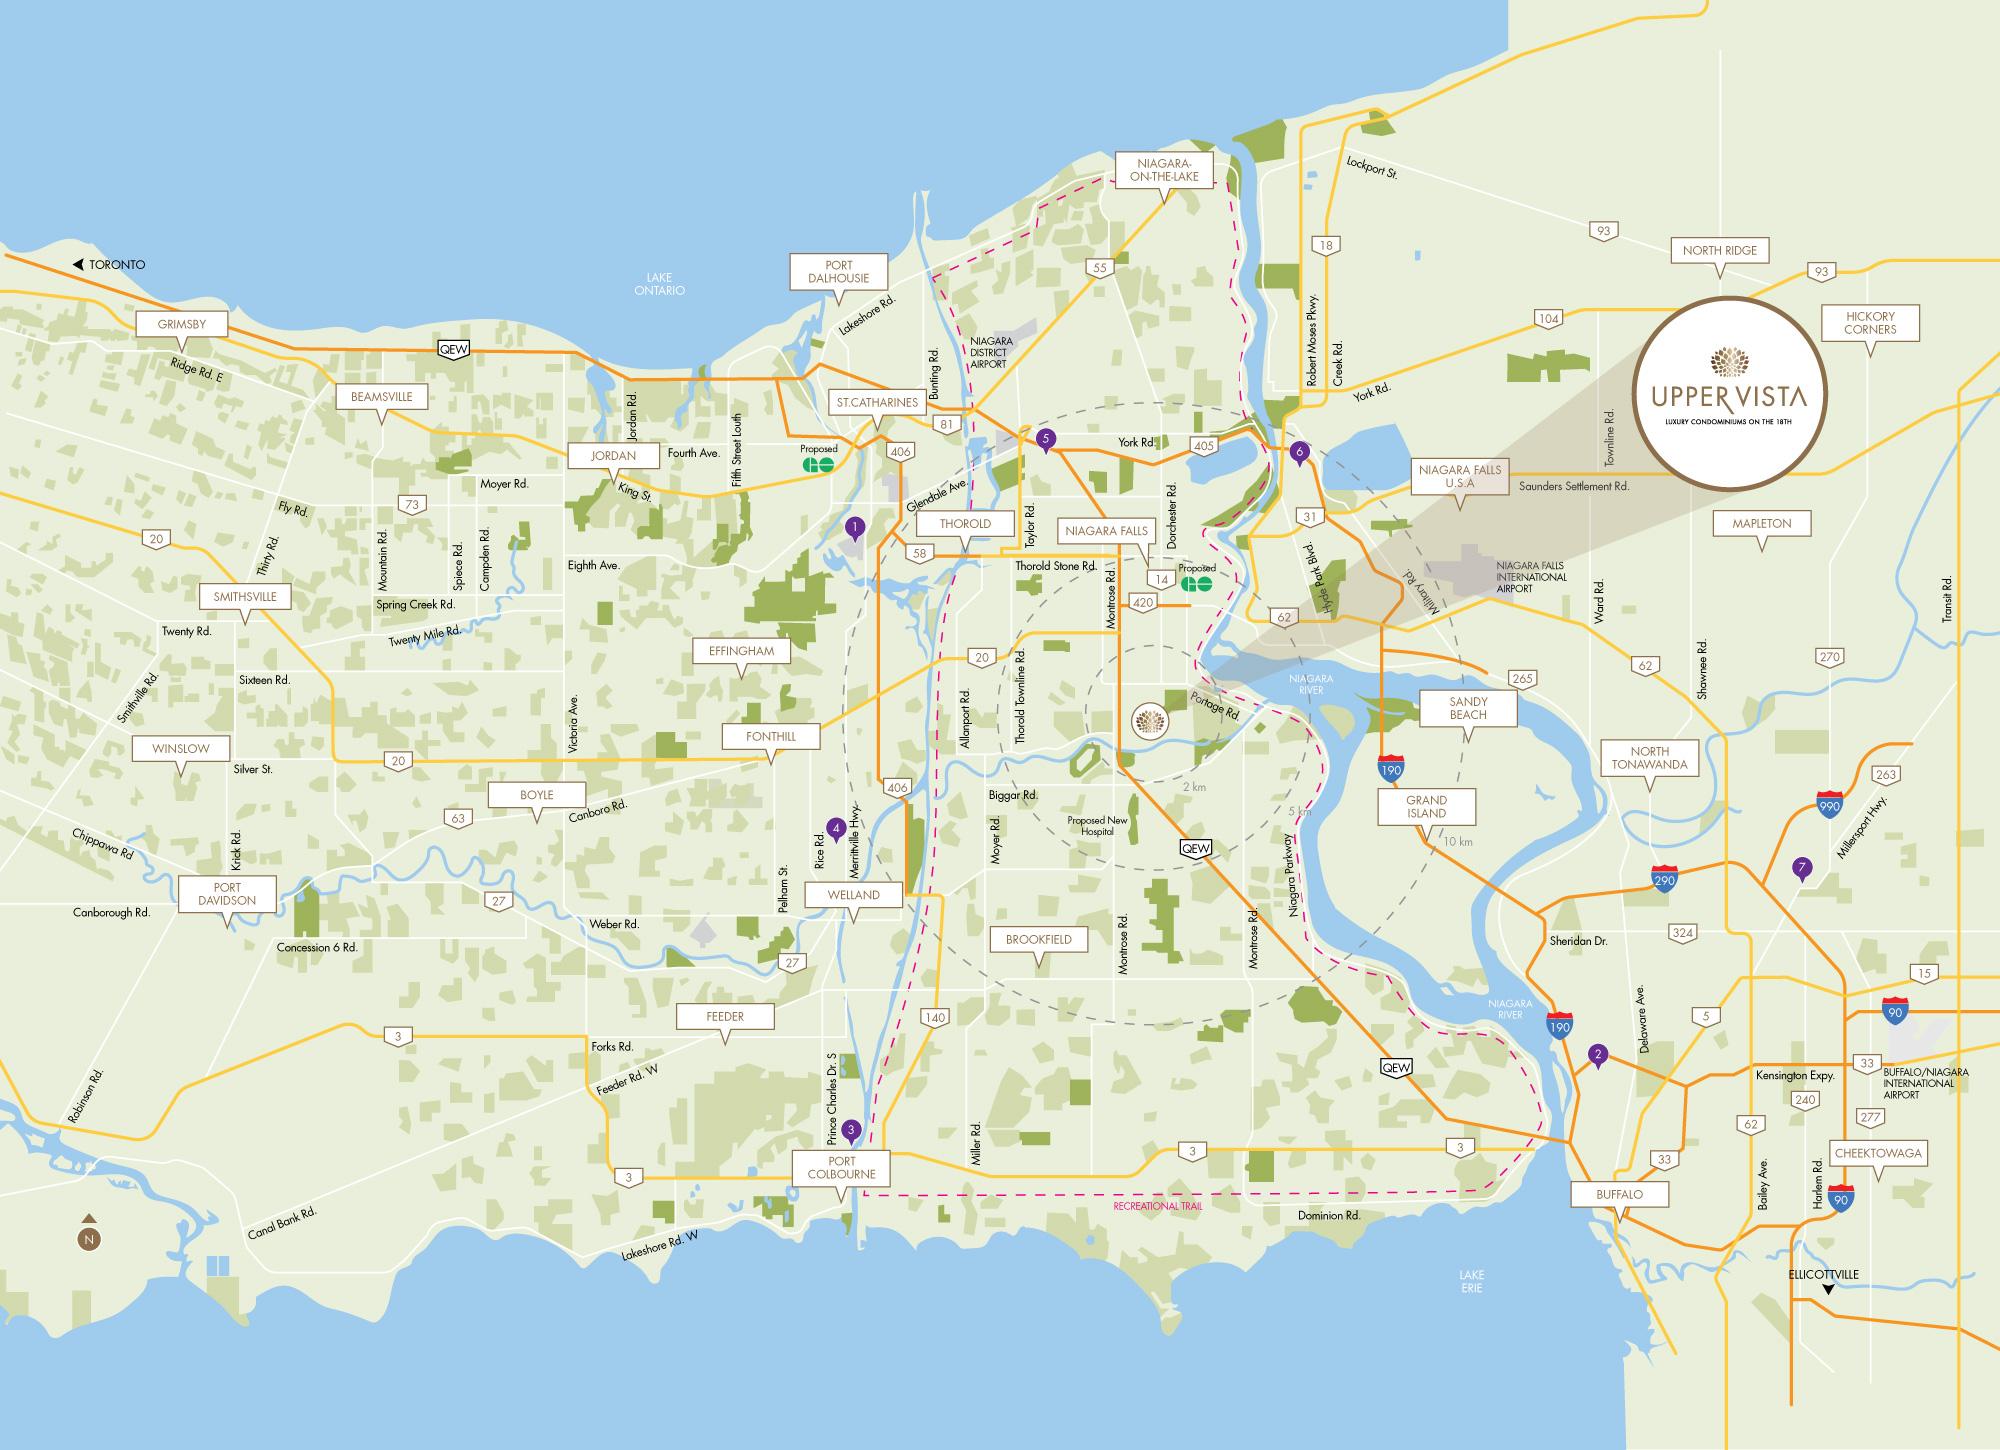 Schools map image